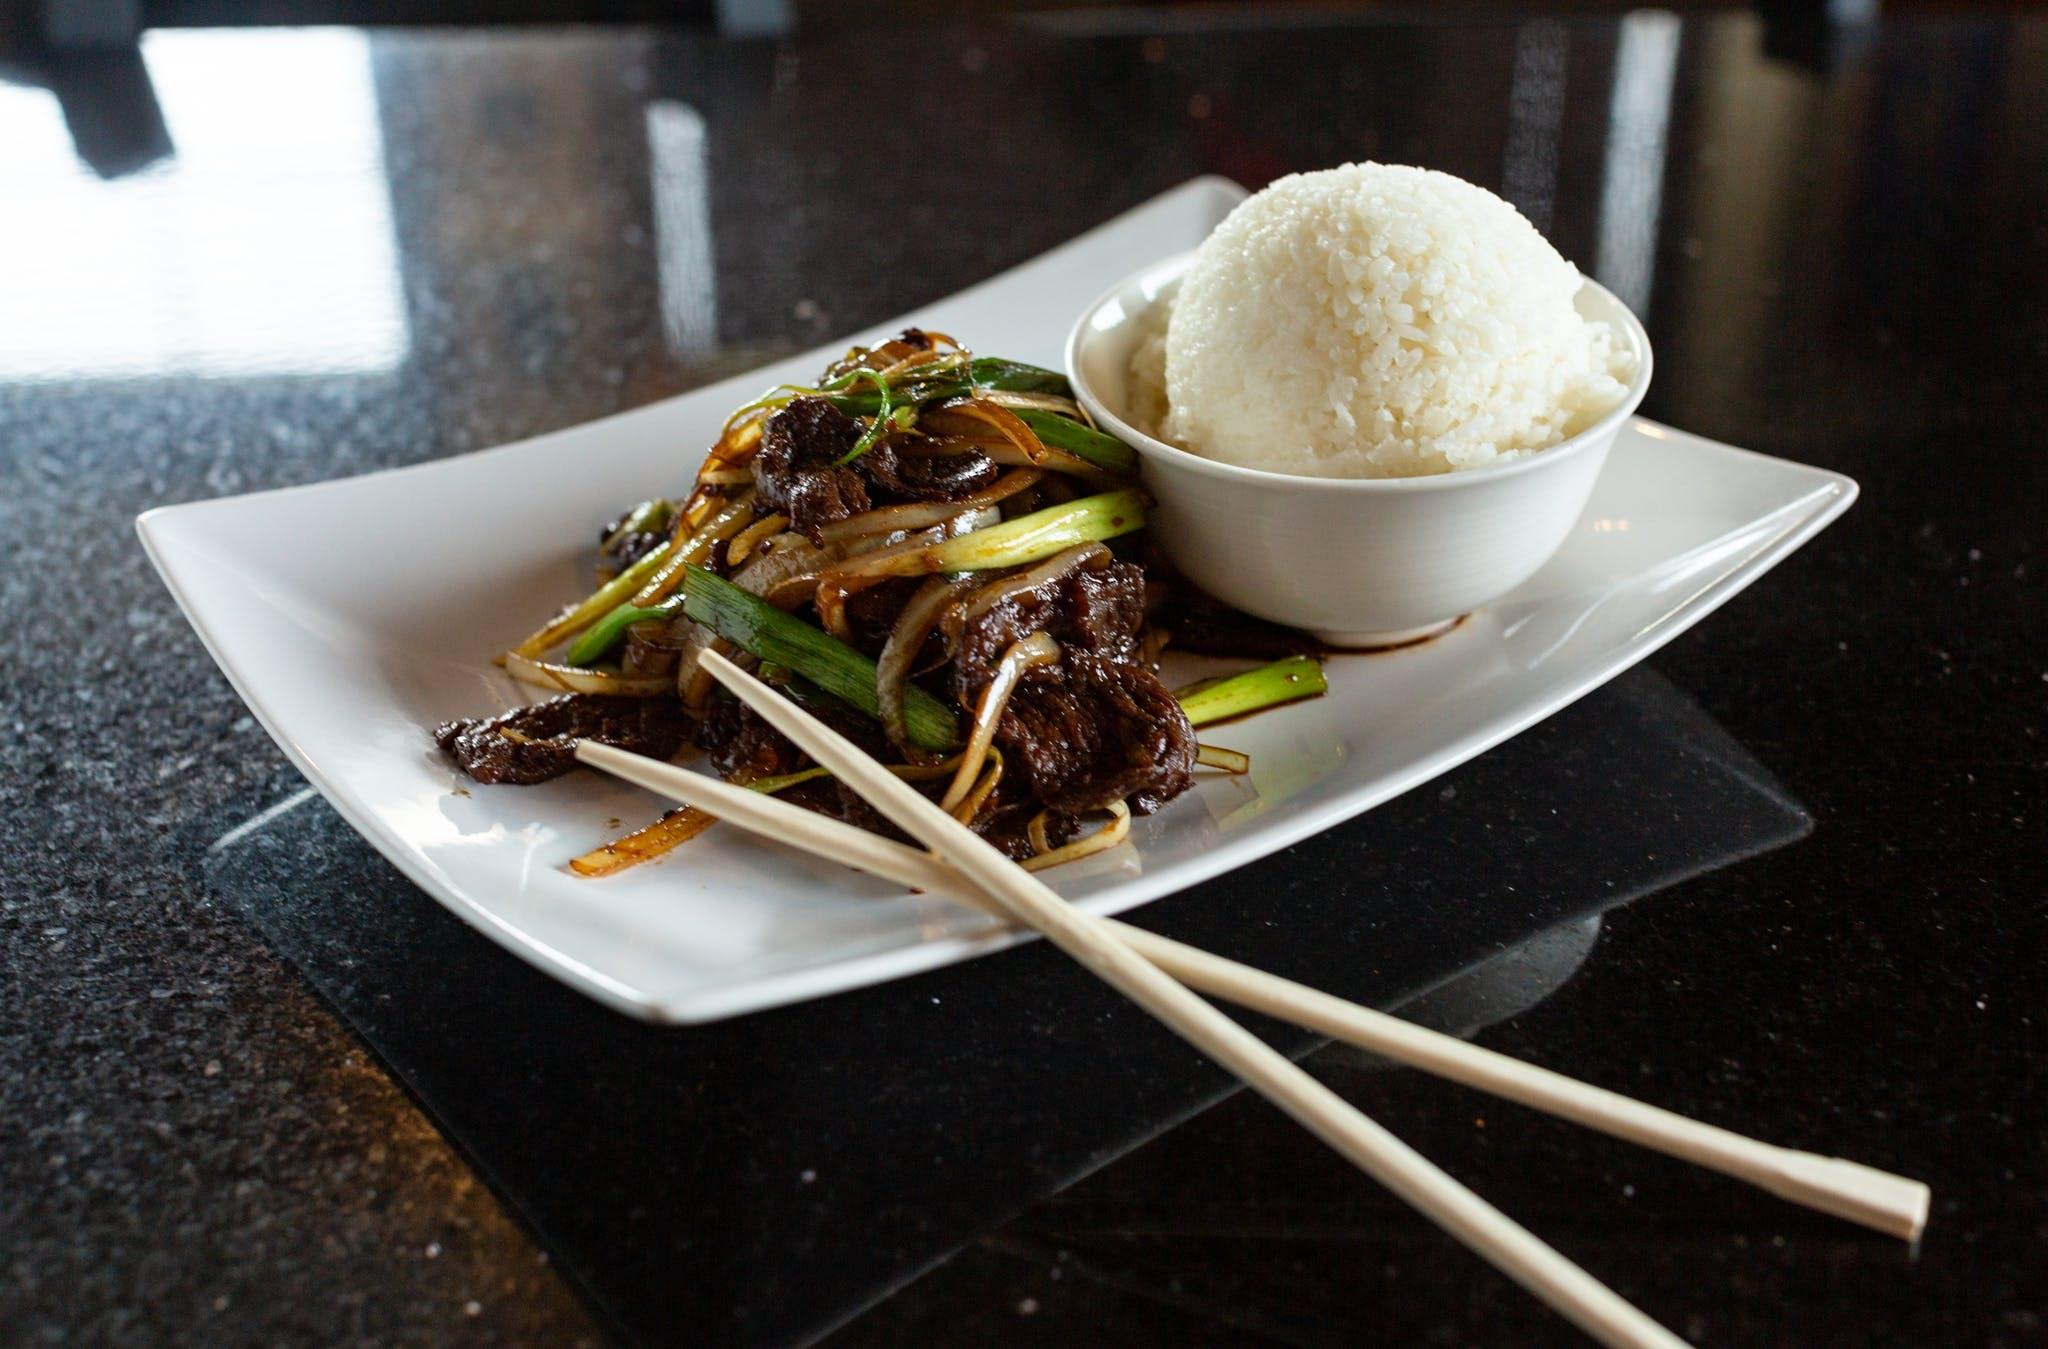 Bulgogi Beef from Oriental Bistro & Grill in Lawrence, KS